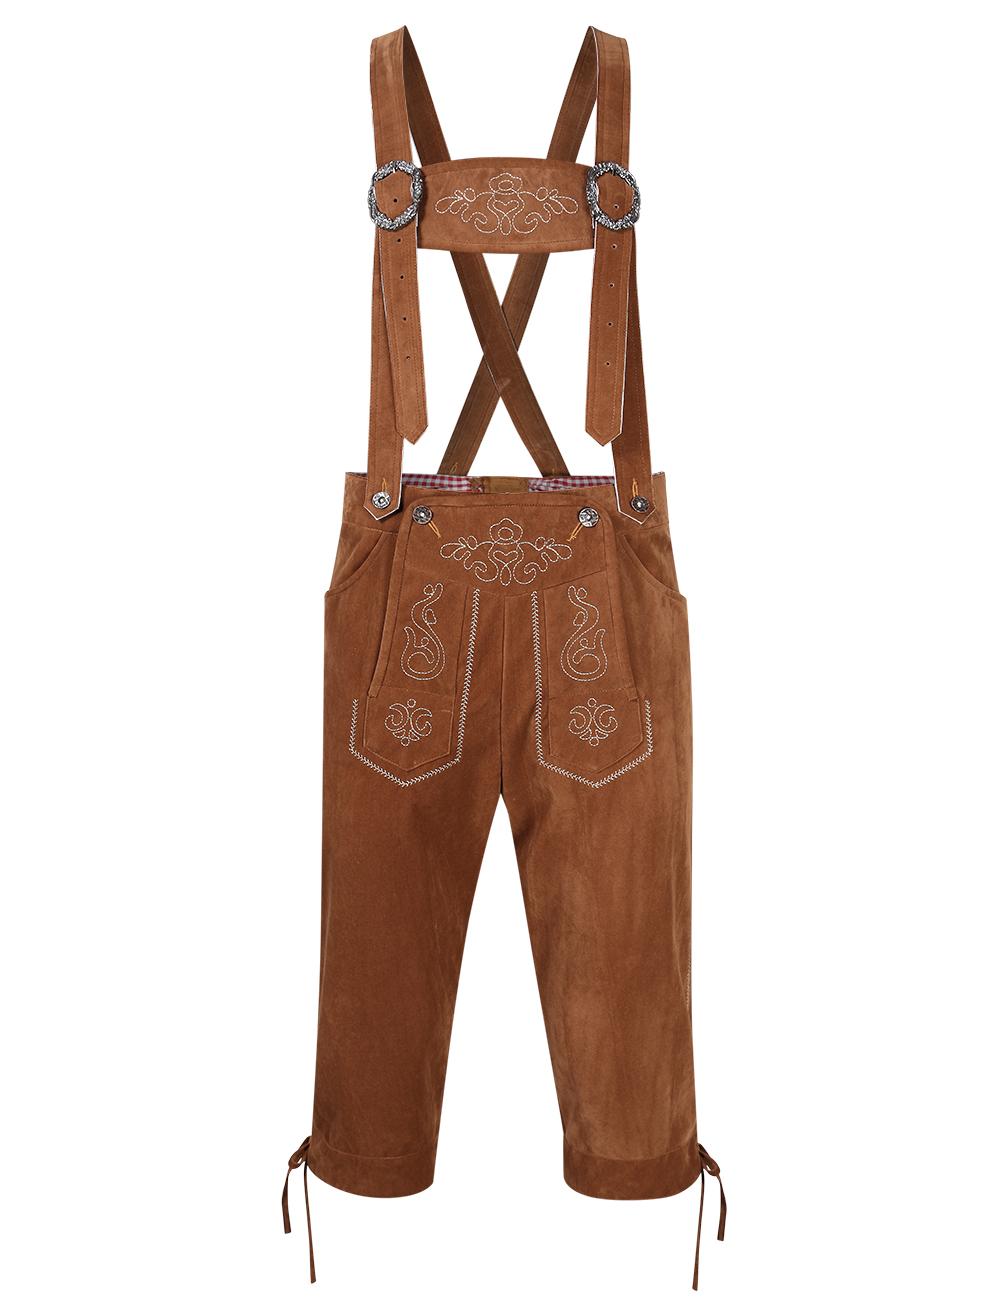 Clearlove Men's Stylish Embroidery Strap Pants Vintage Faux Fleece Party Dress Pants for Oktoberfest